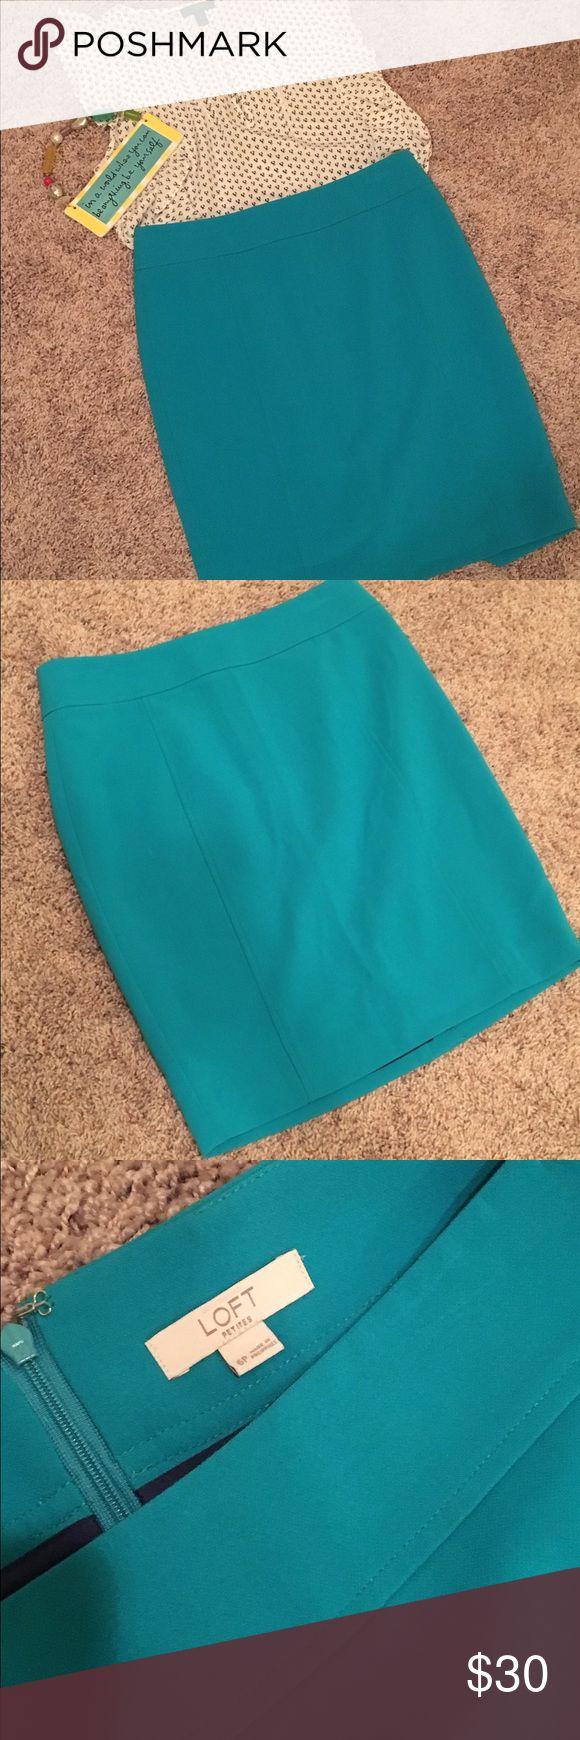 LOFT petite turquoise pencil skirt LOFT petite pencil skirt. Great condition! Worn less than 5 times. LOFT Skirts Pencil